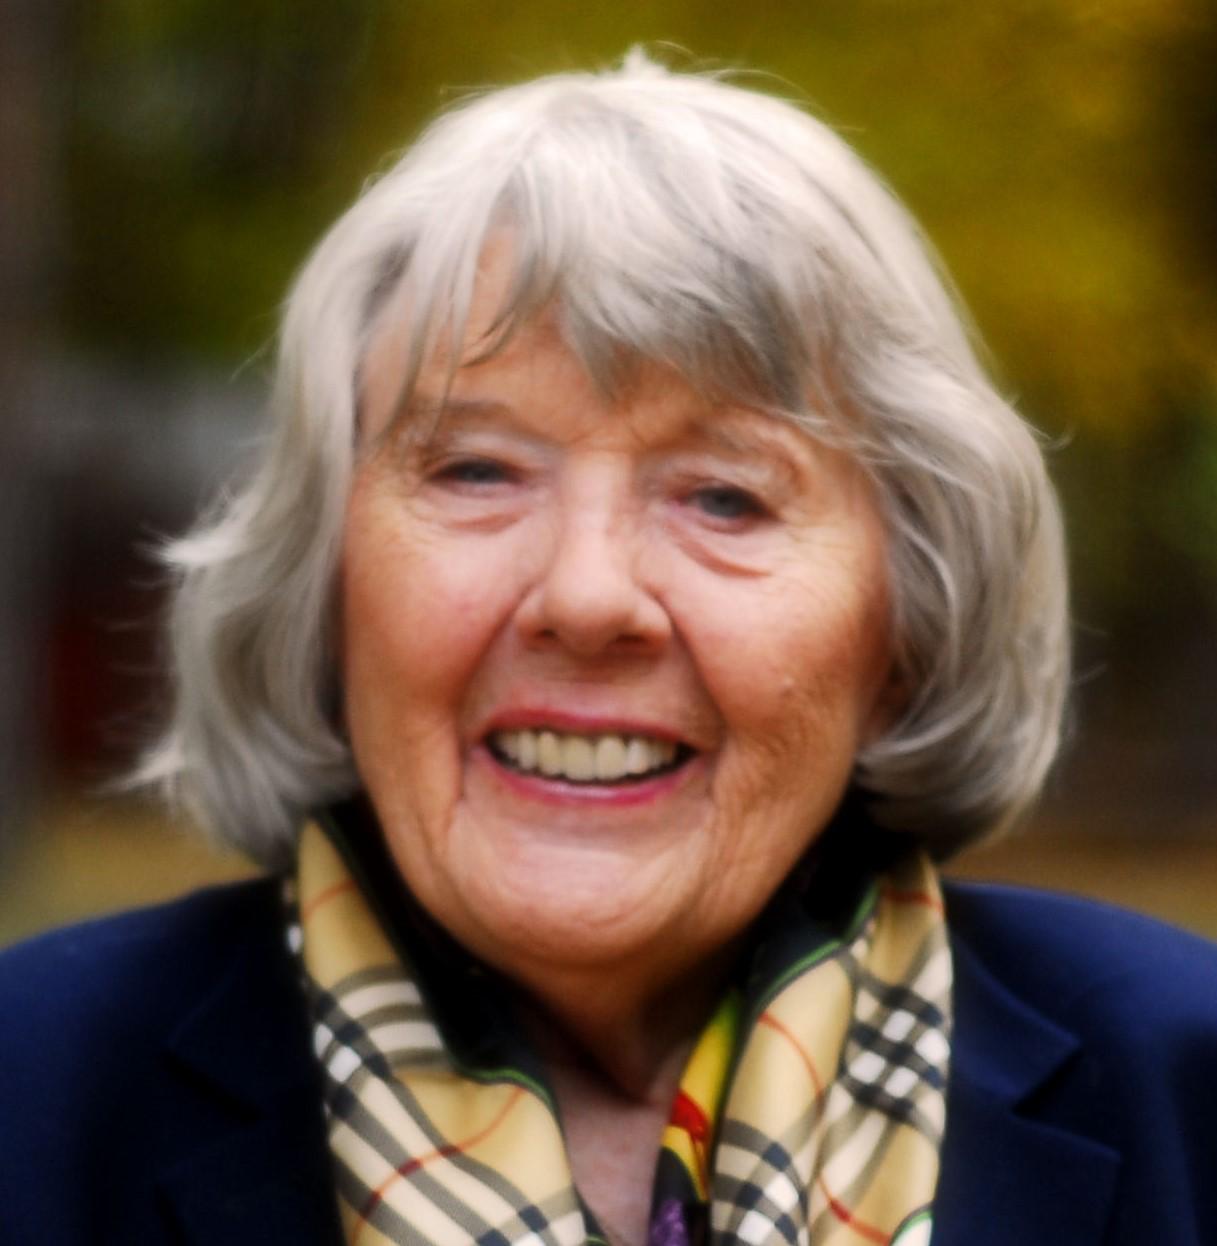 Joyce Mesmer, a Wisner, NE